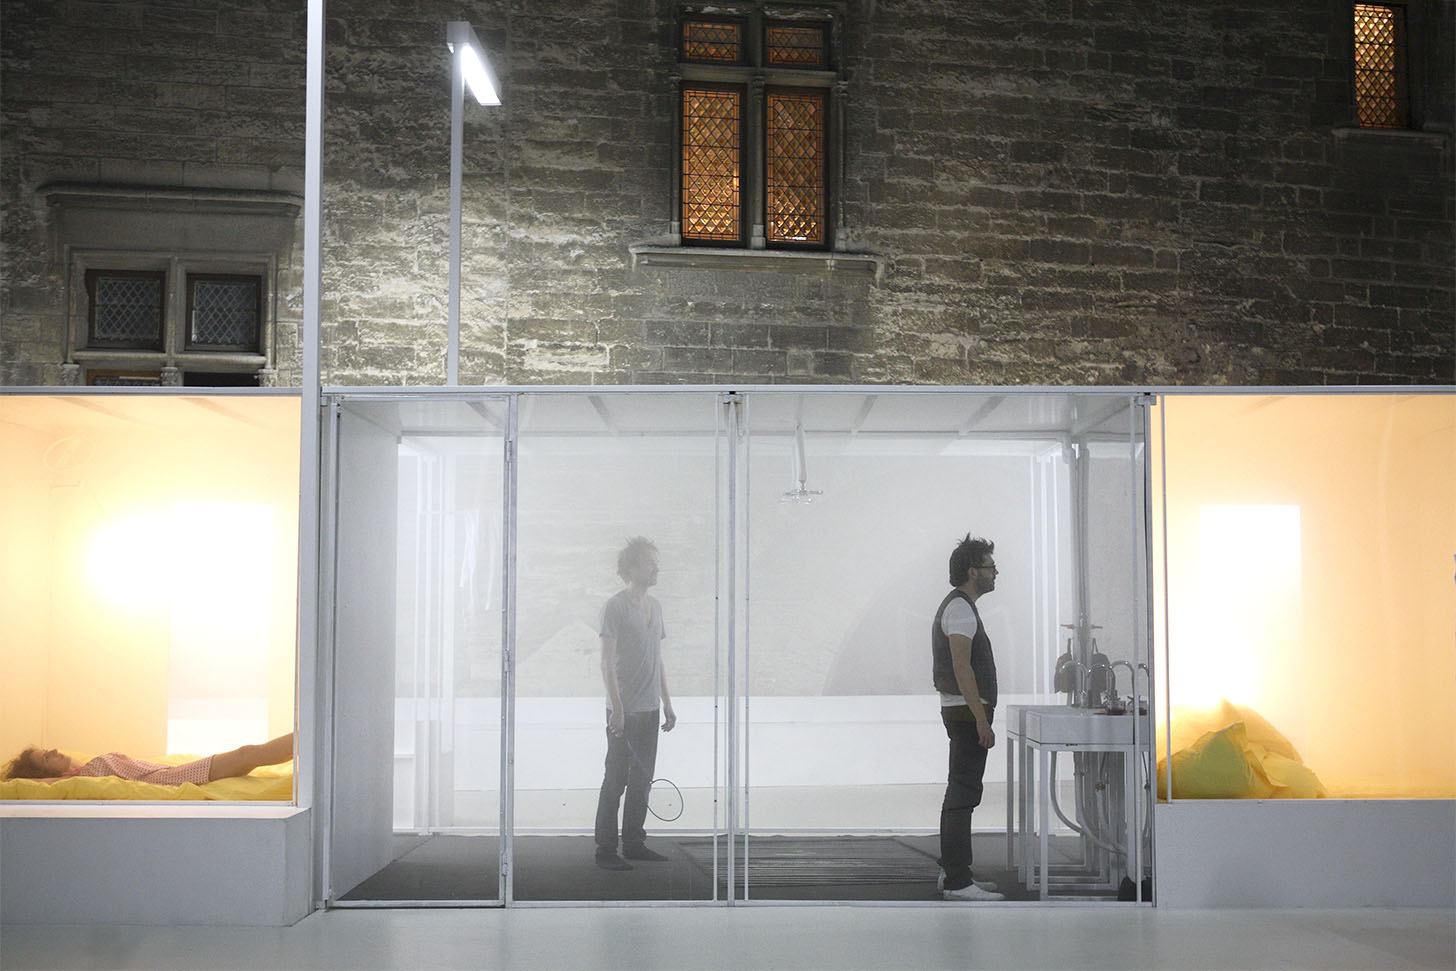 Berger&Berger, Theater, FH/237 aps Etape 2, Avignon, 2010